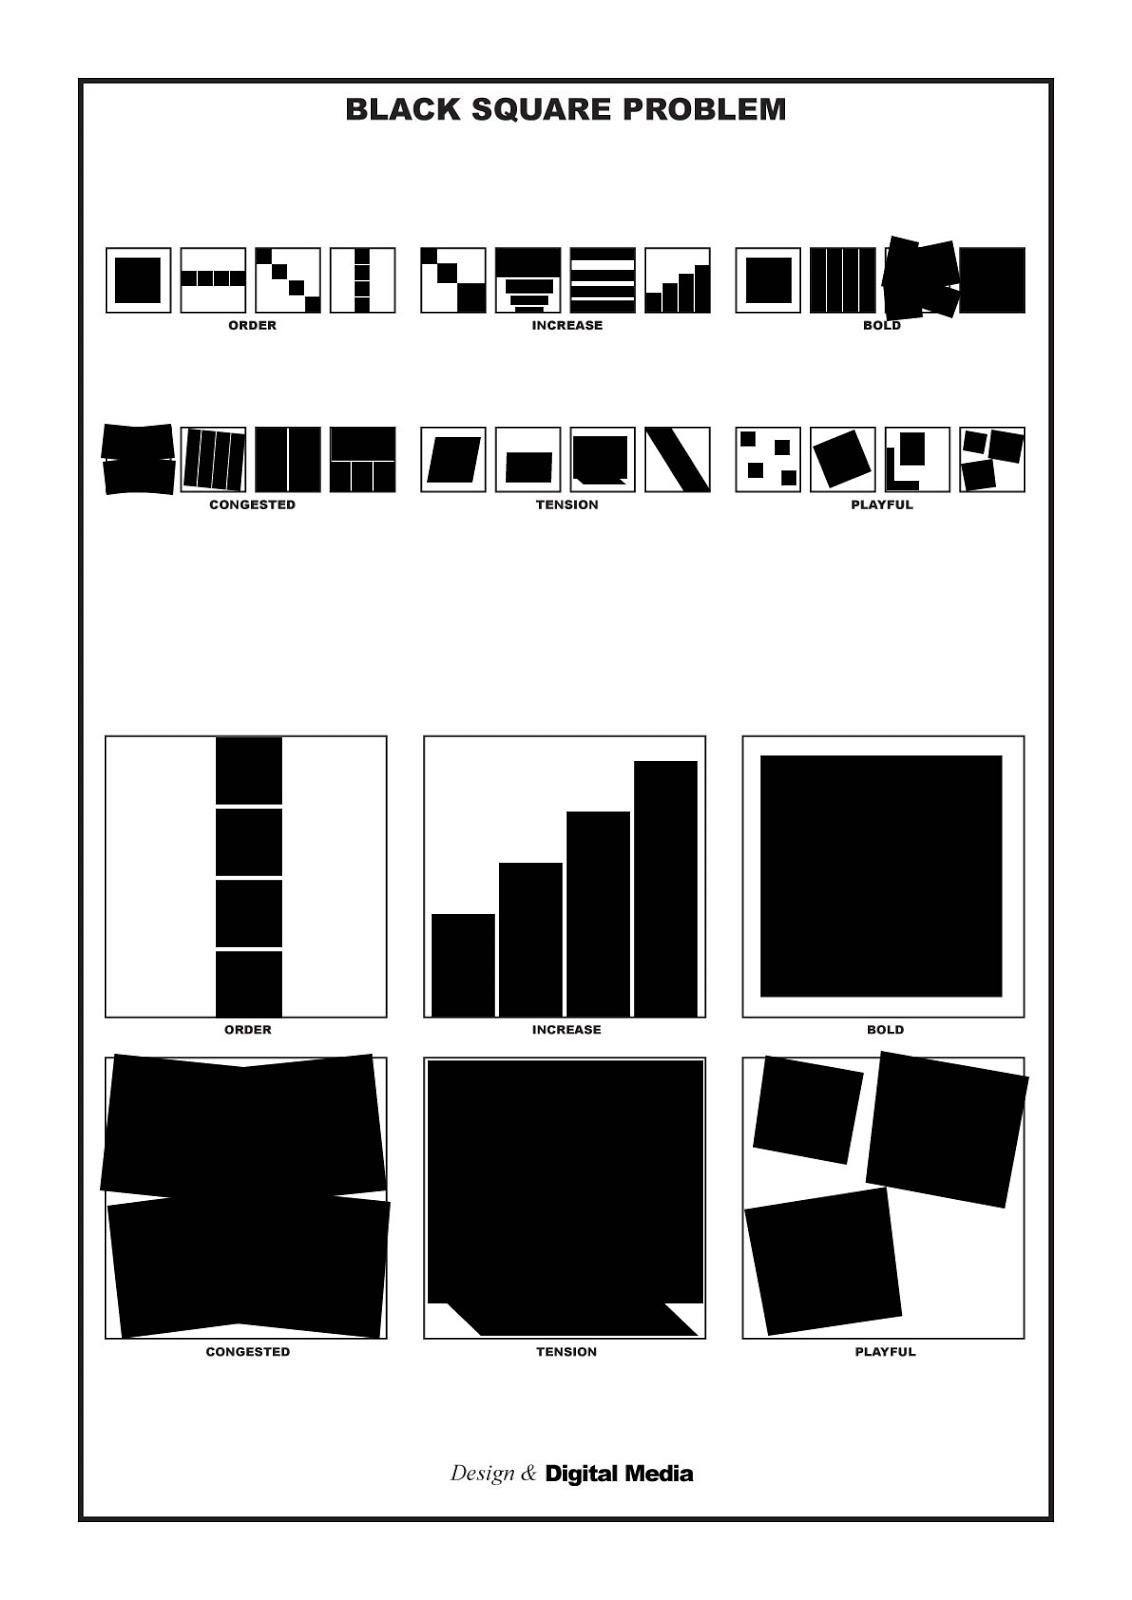 Media: Black Square Problem